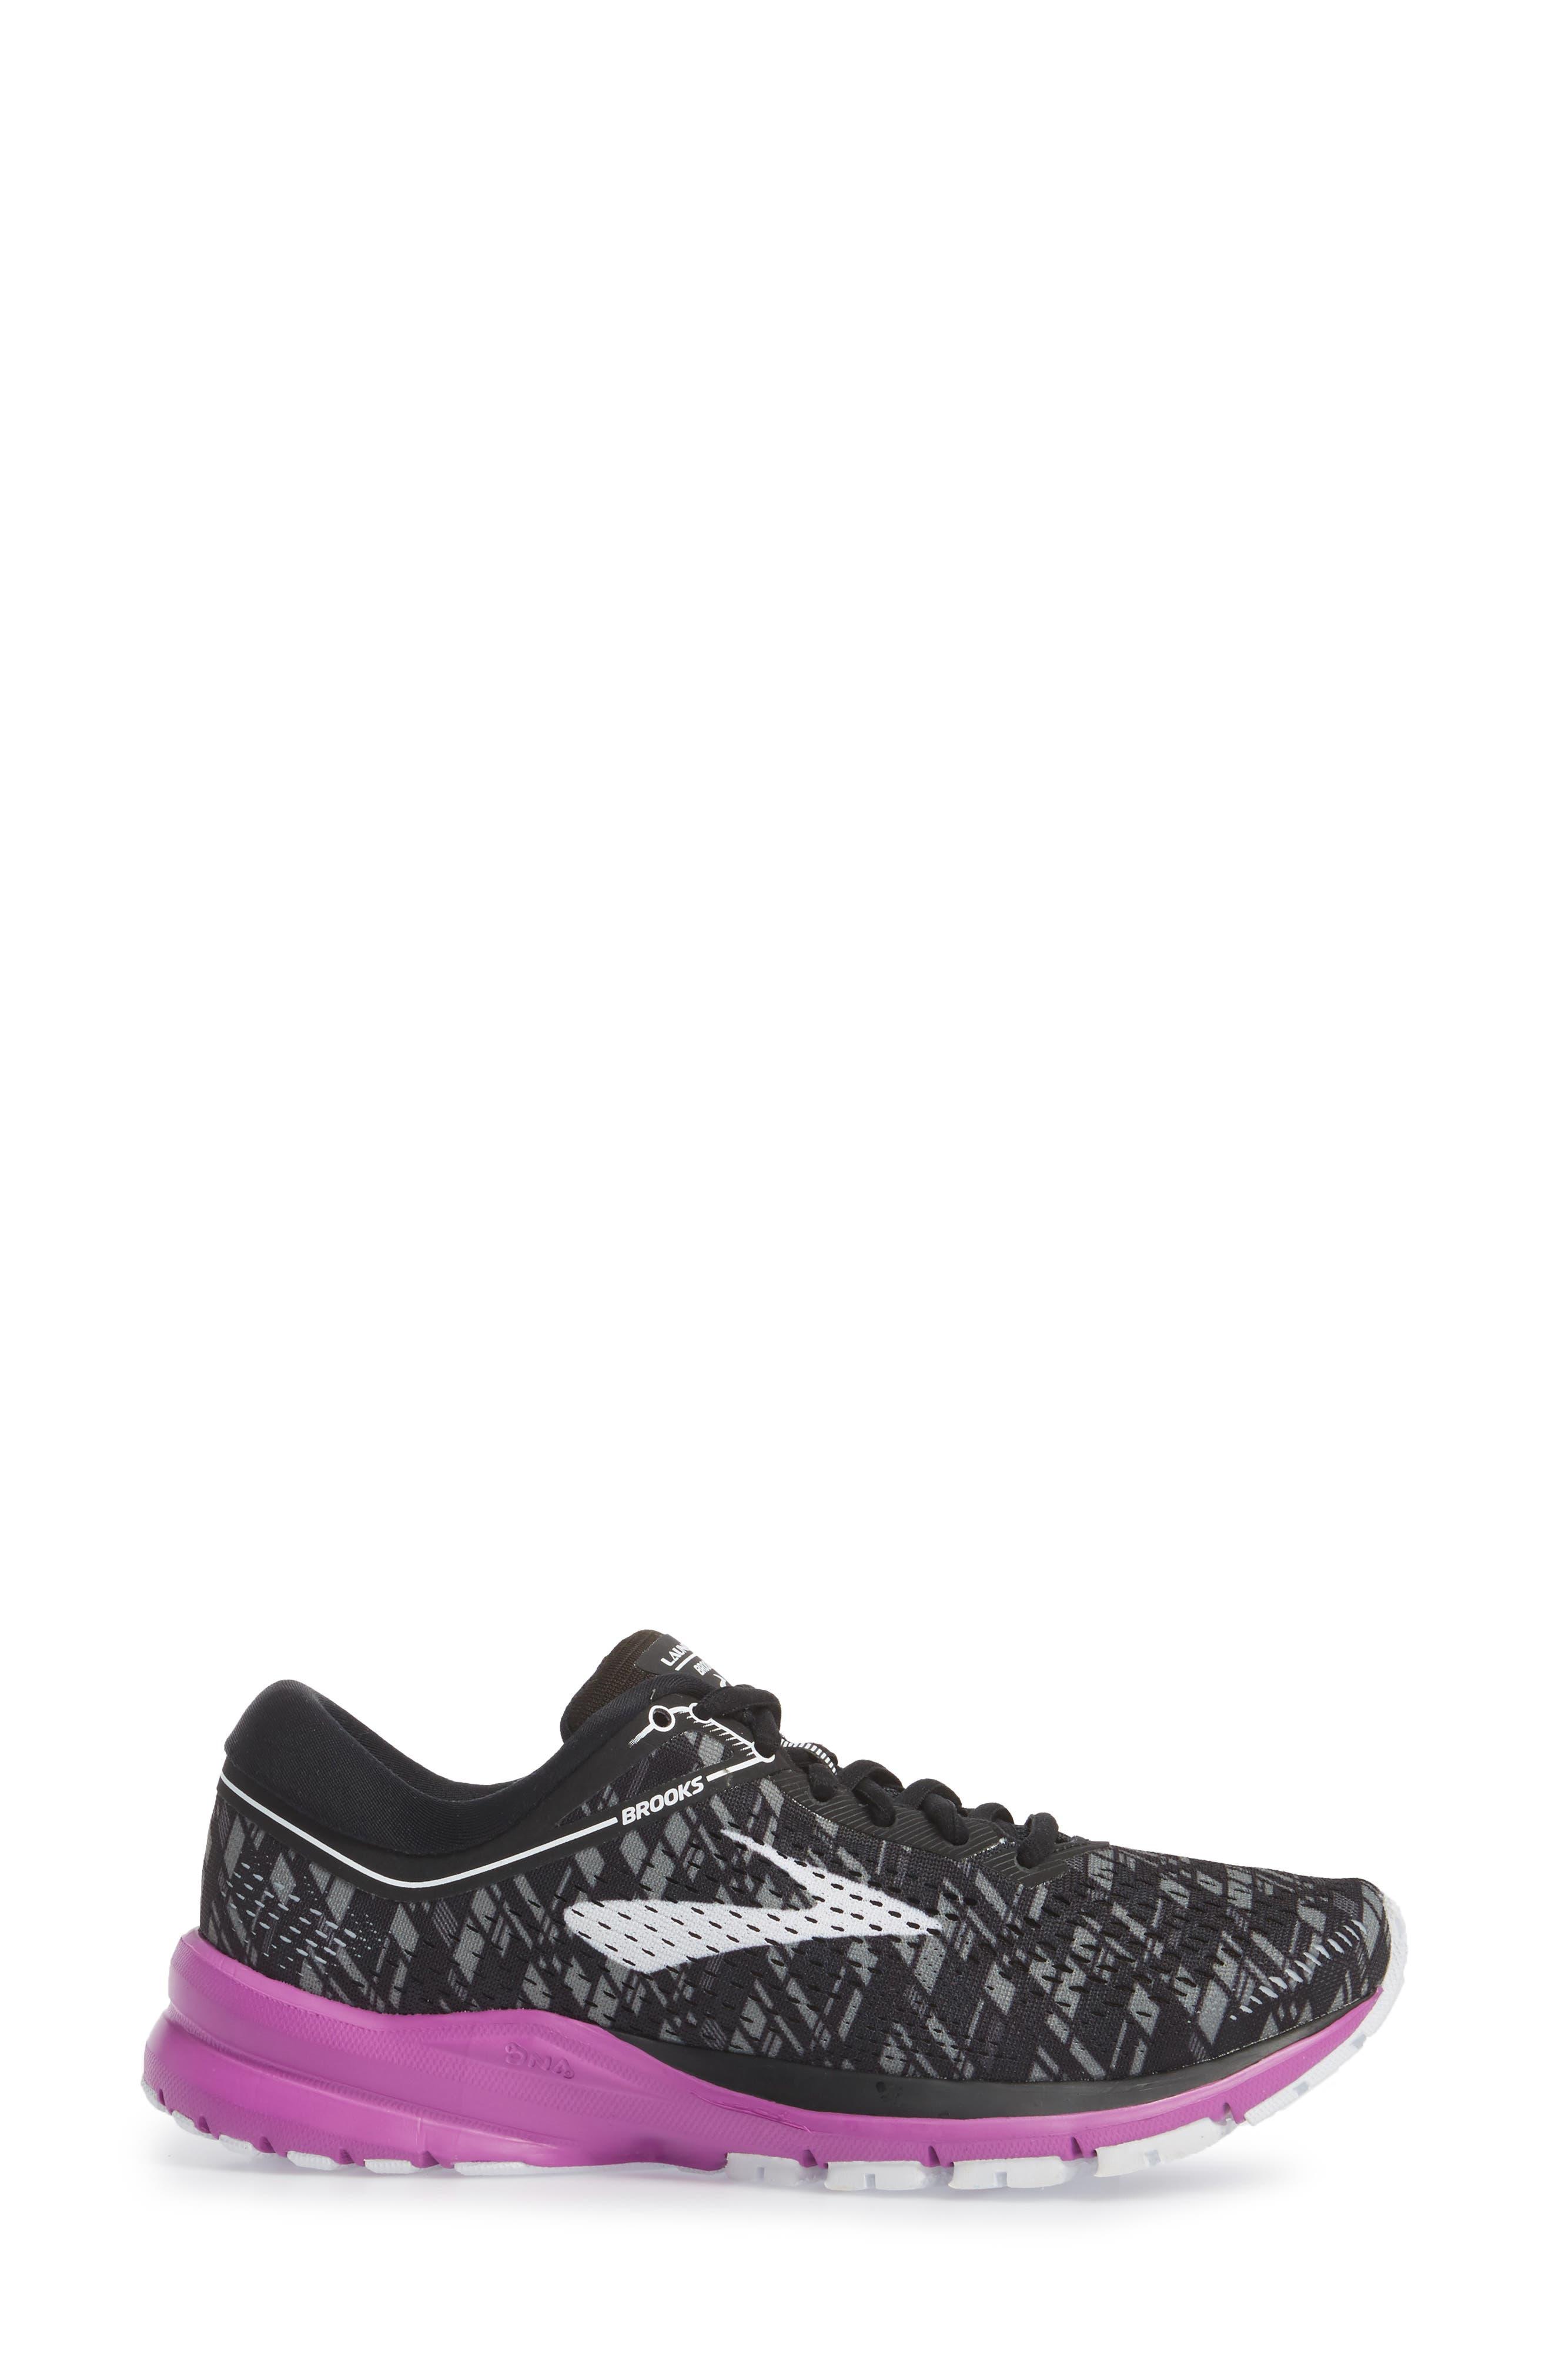 Launch 5 Running Shoe,                             Alternate thumbnail 3, color,                             BLACK/ PURPLE/ PRINT